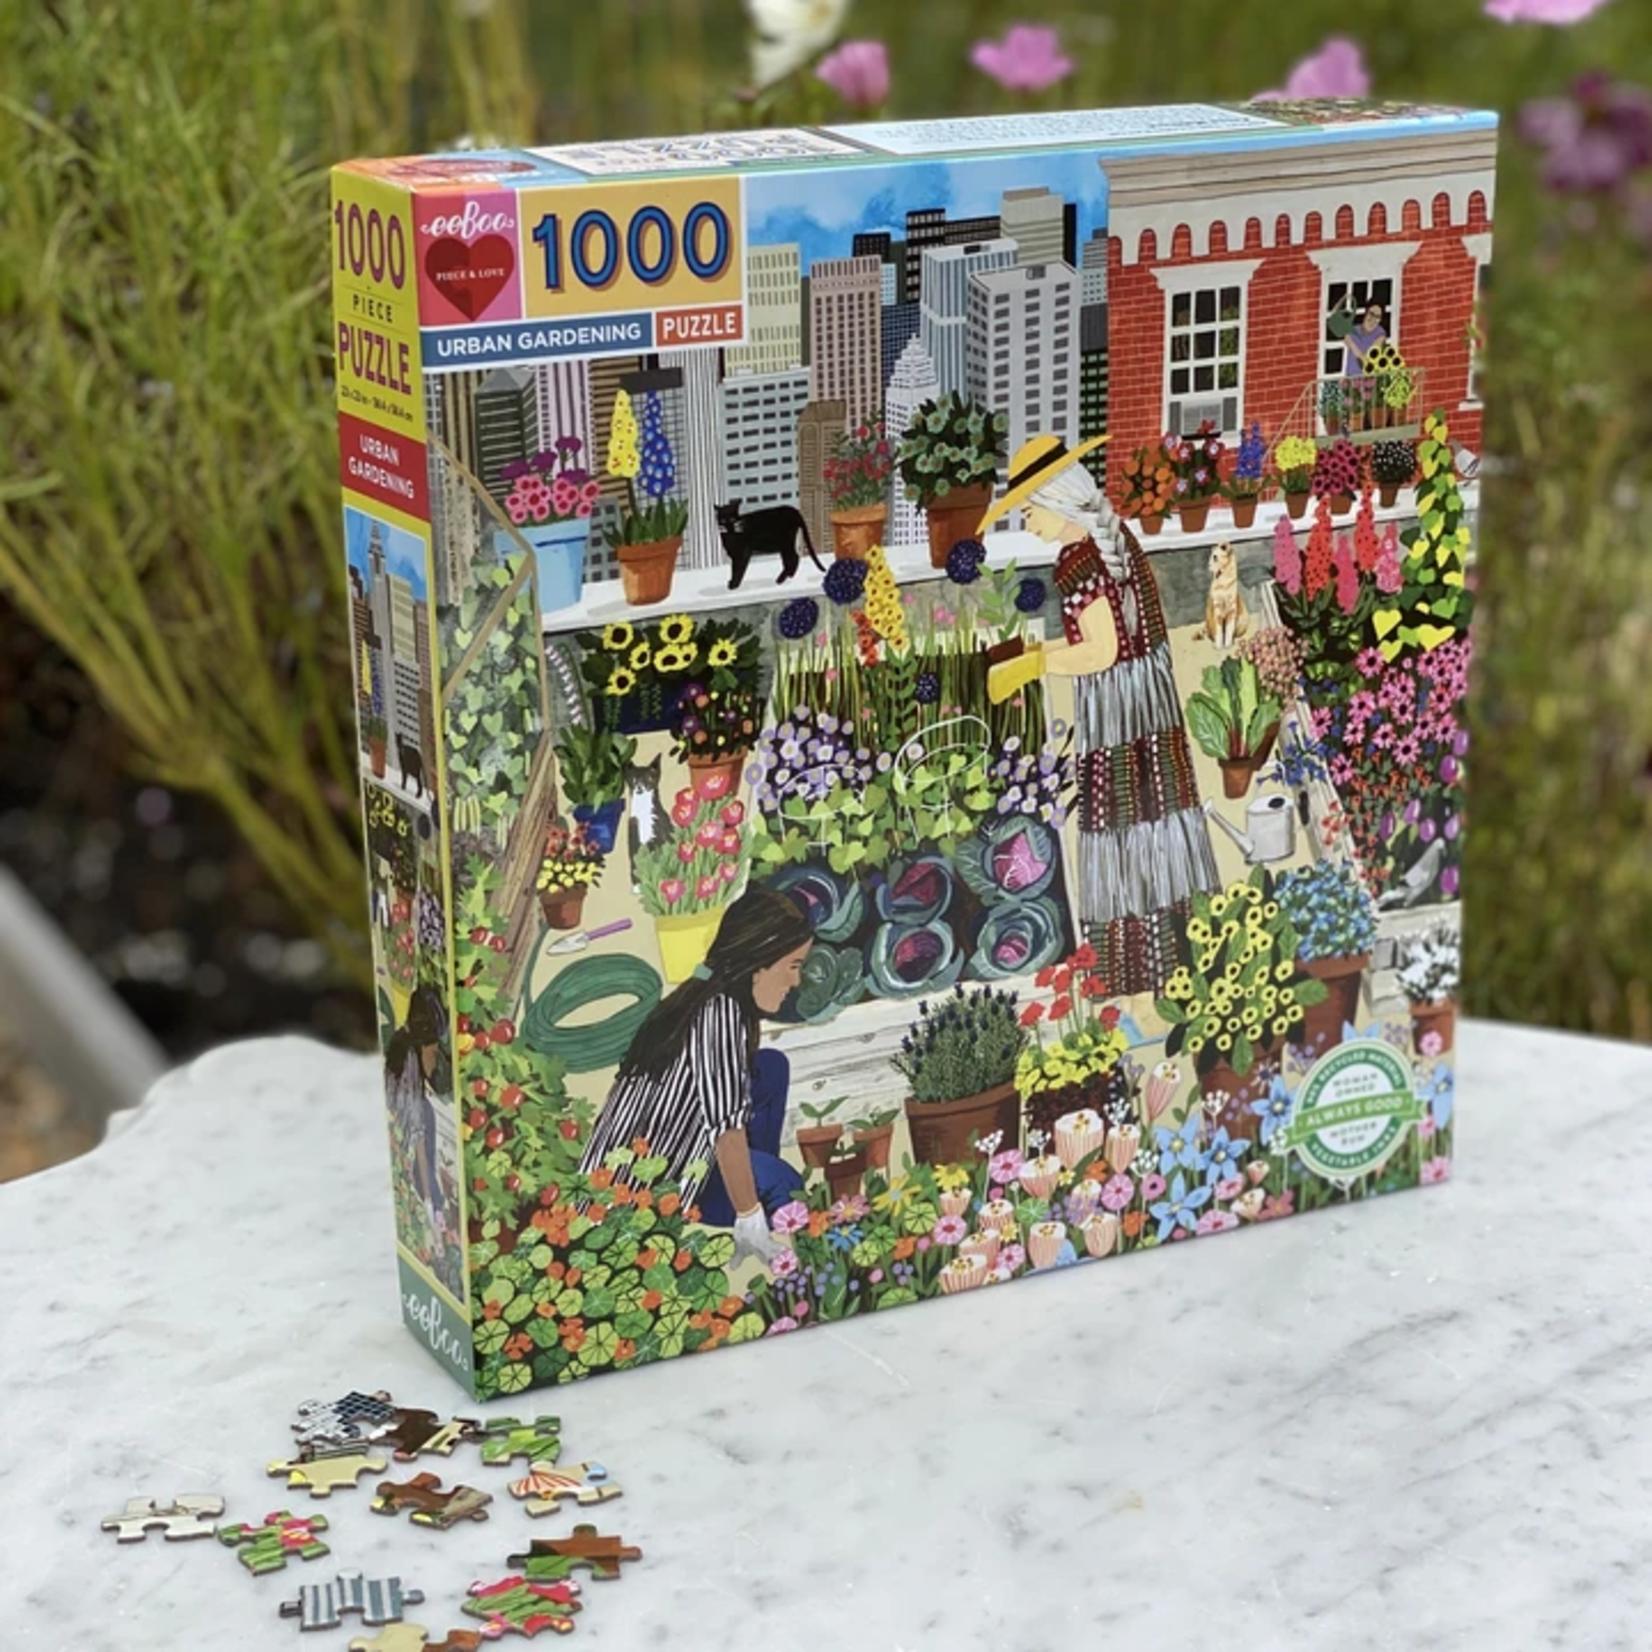 Eeboo Urban Gardening - 1000 Piece Jigsaw Puzzle